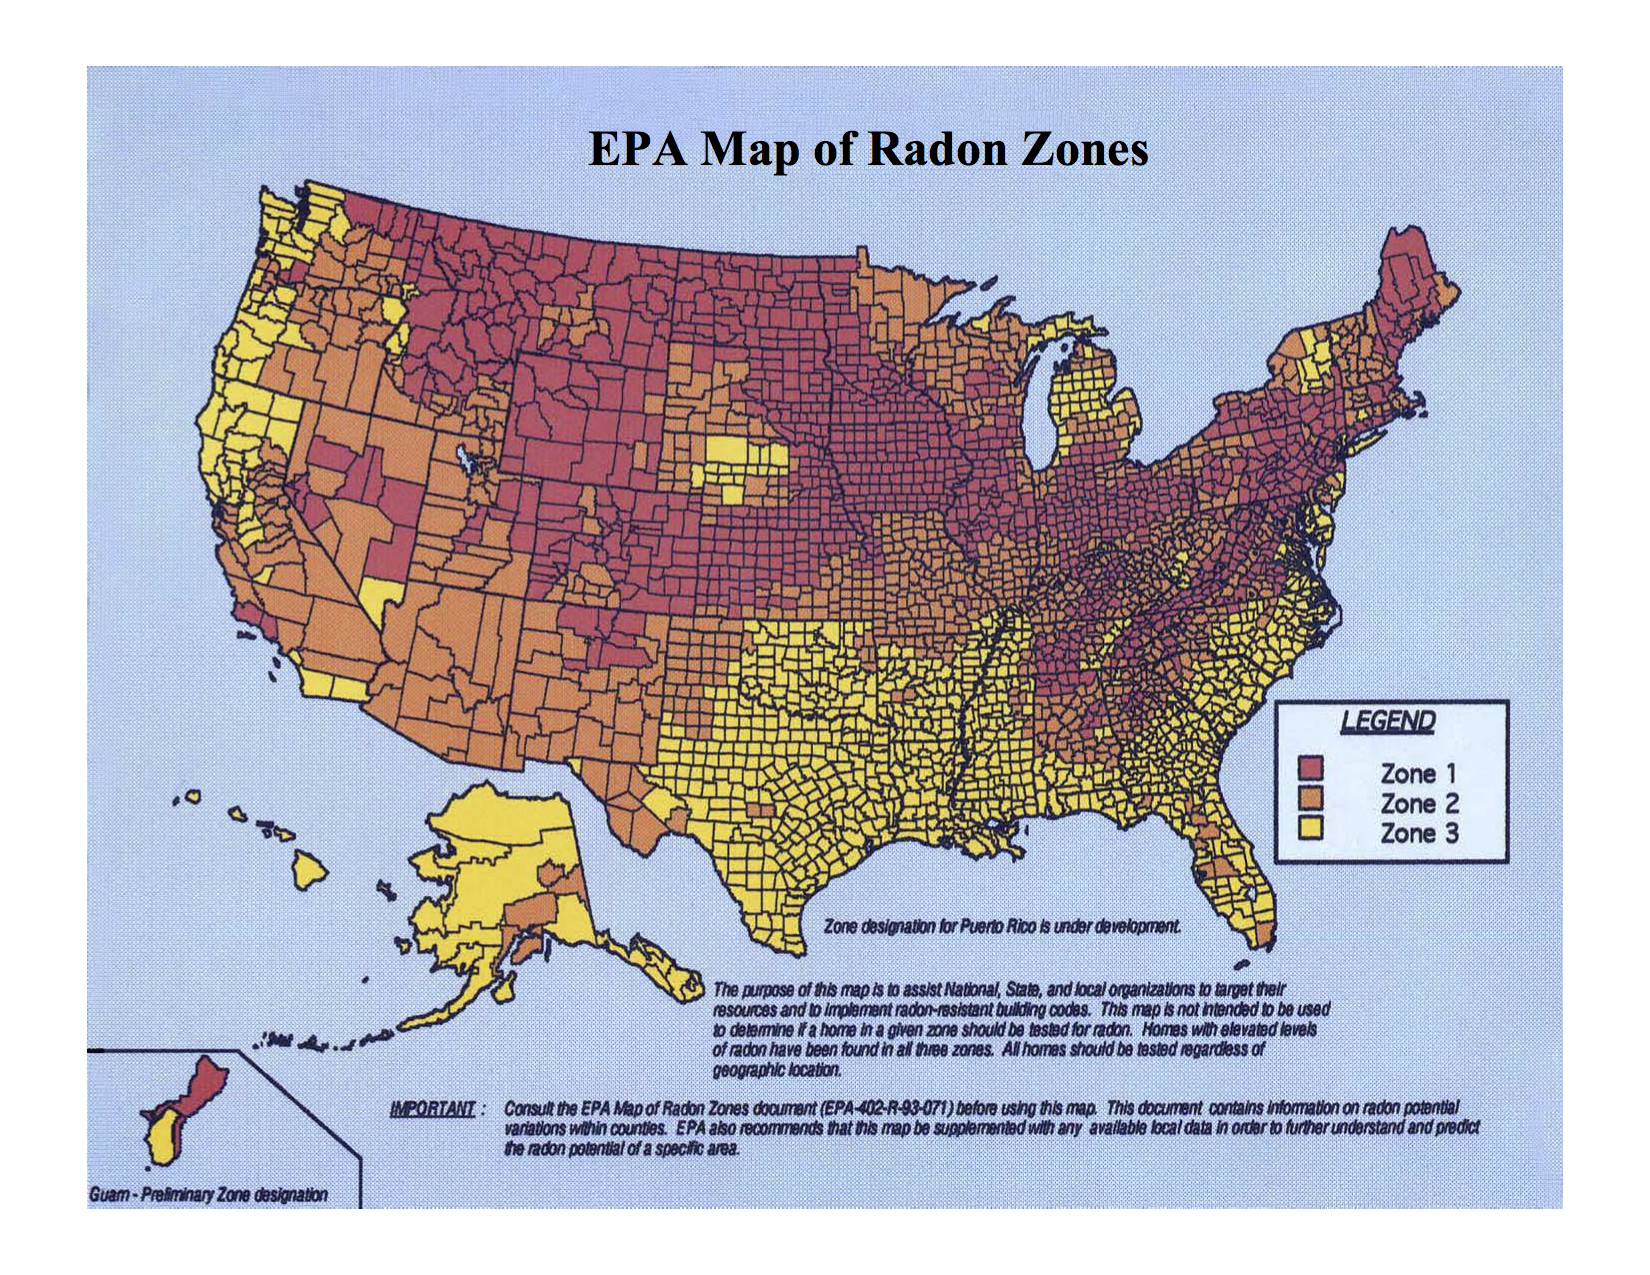 EPA Radon Zone Classifications